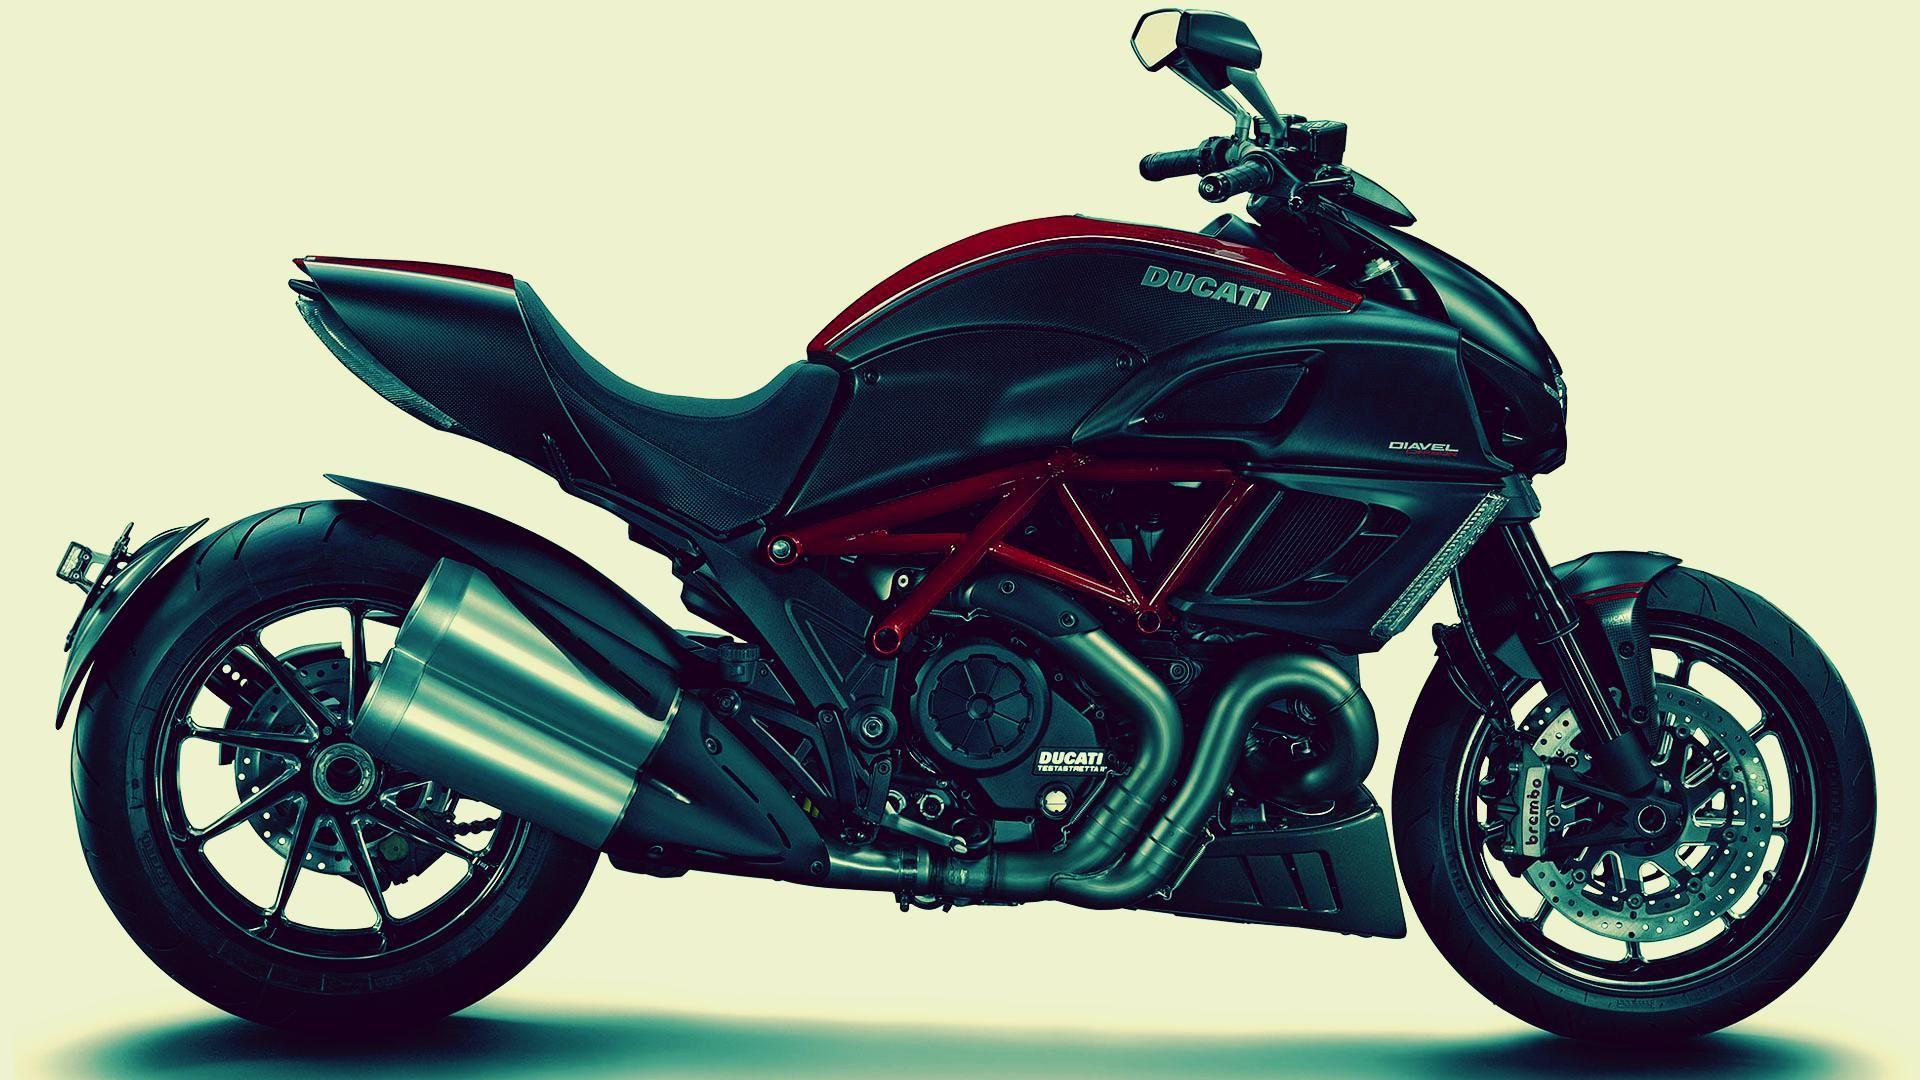 Carbon Fiber Ducati 2014 Ducati Diavel Carbon Full Specs Ducati Diavel Ducati Diavel Carbon Ducati